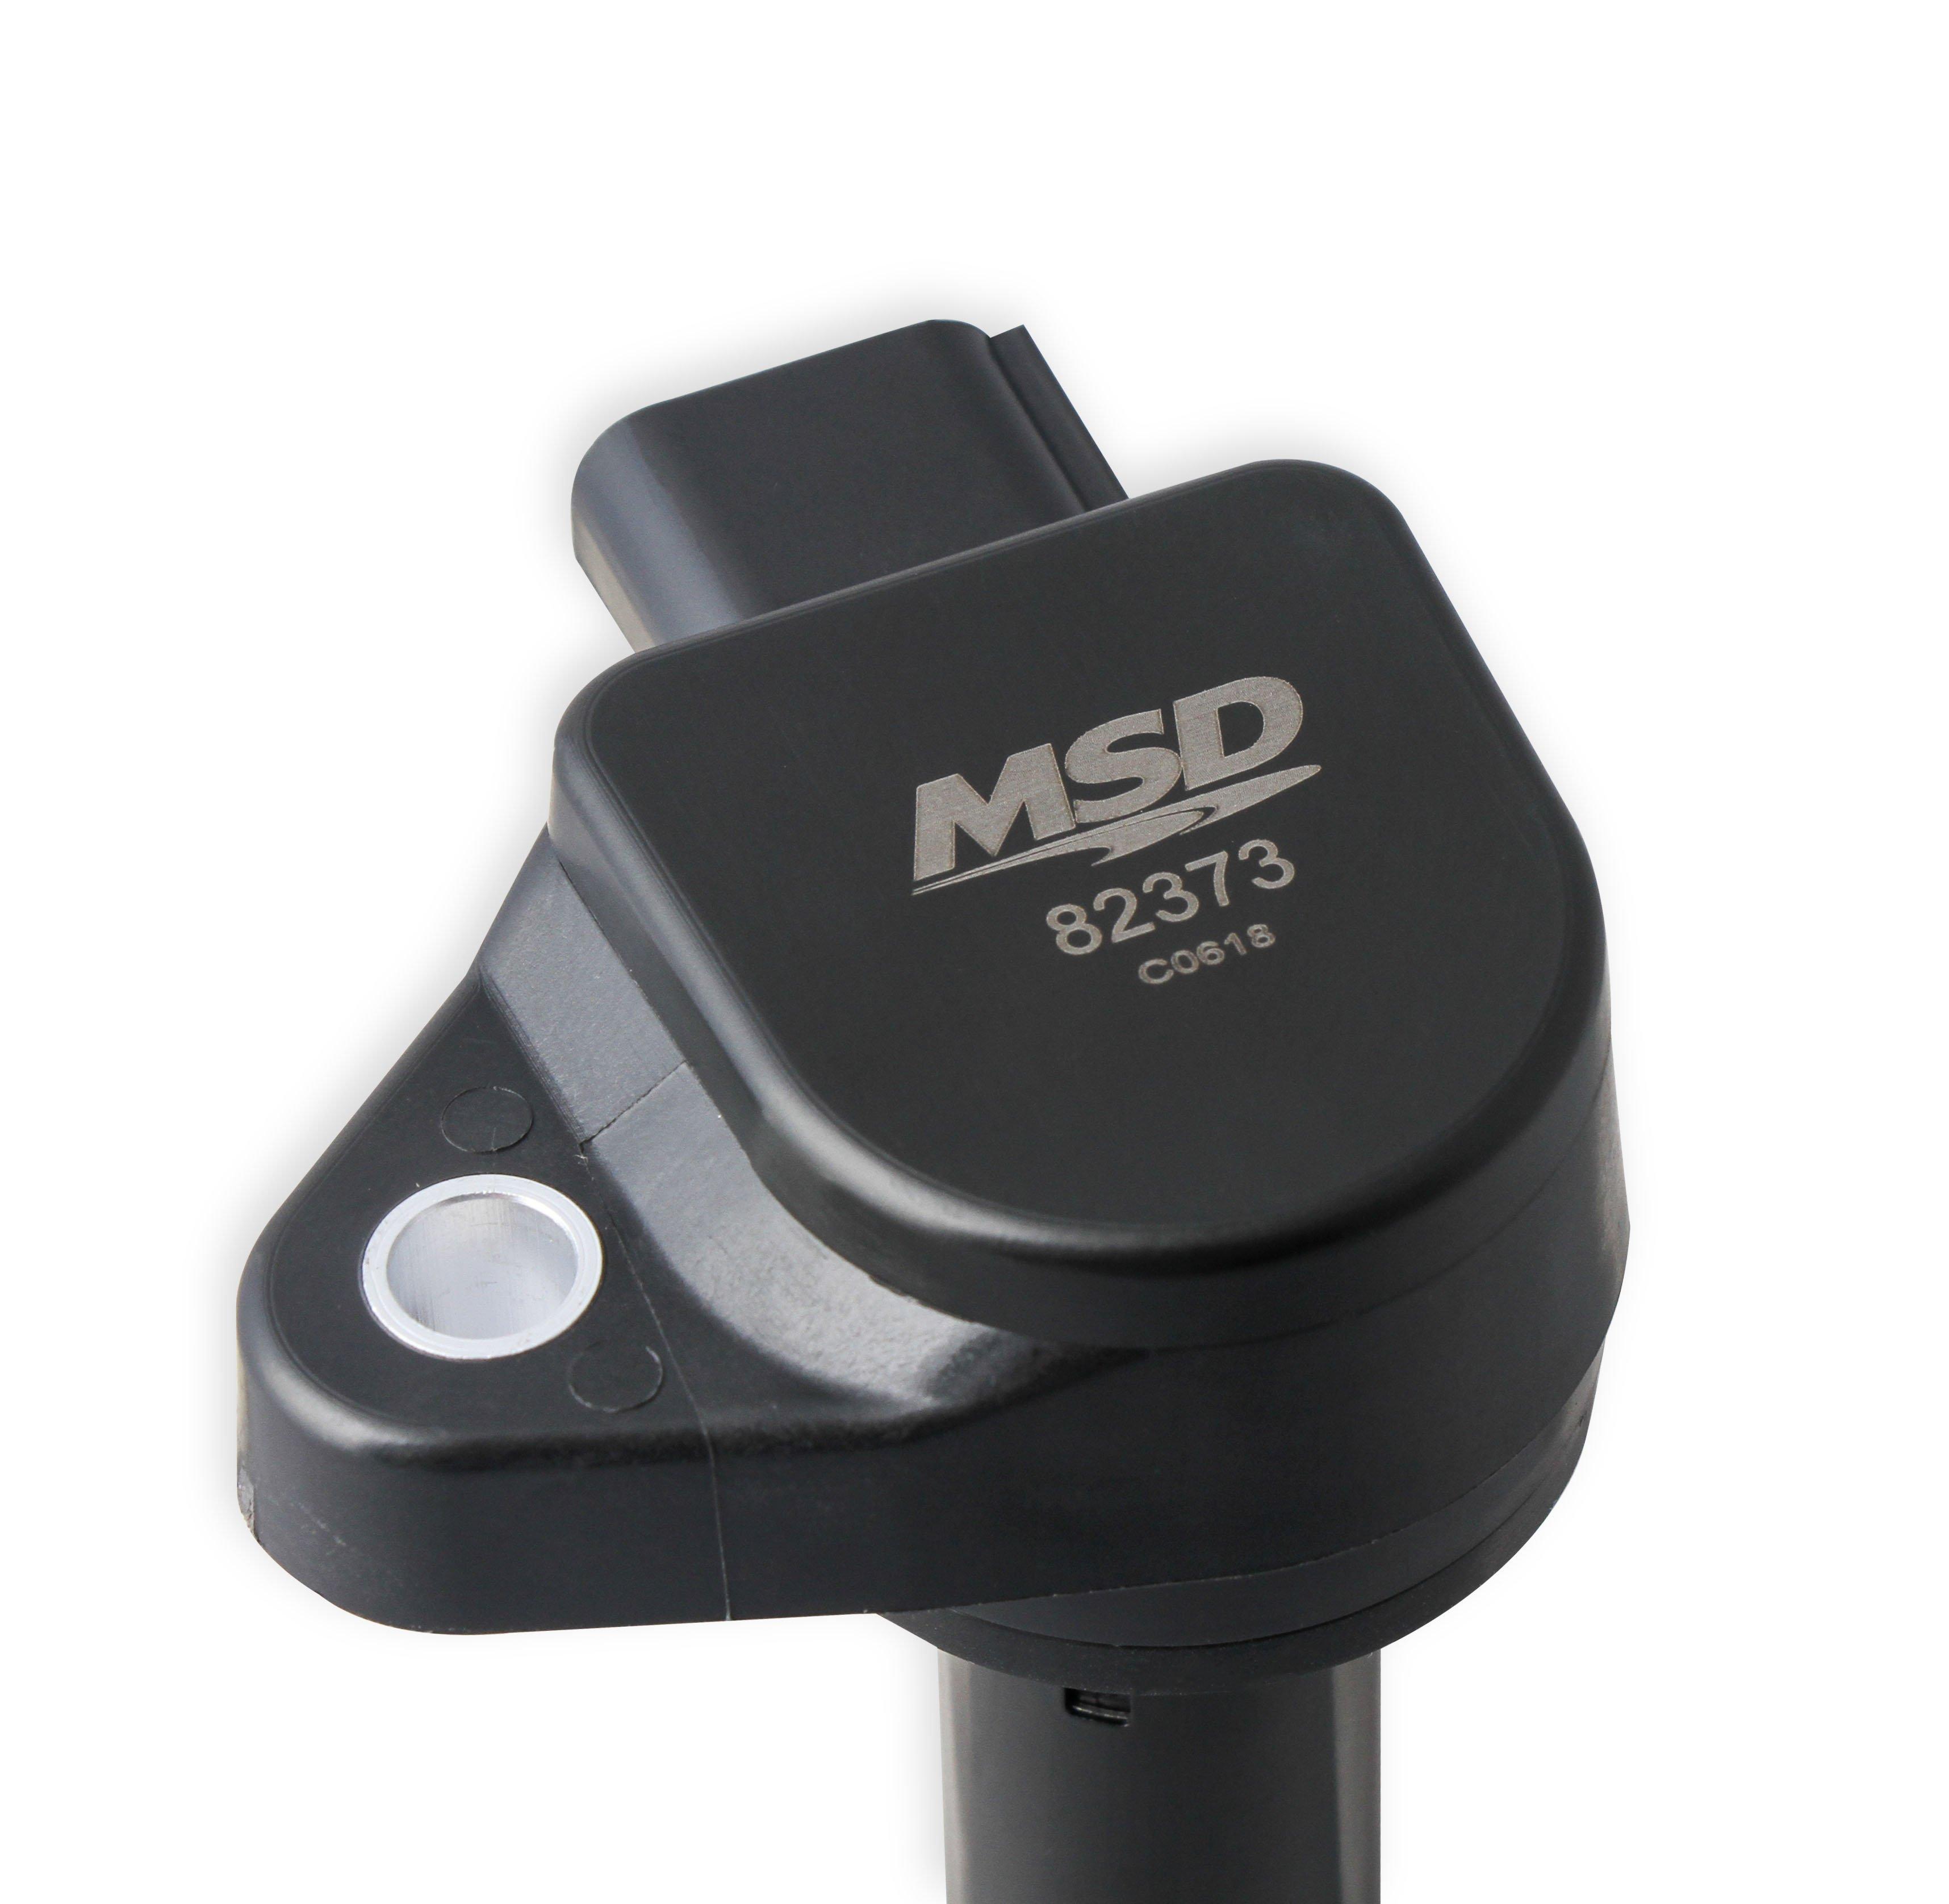 MSD 82373 MSD Ignition Coil Blaster Series 1999-2010 Honda